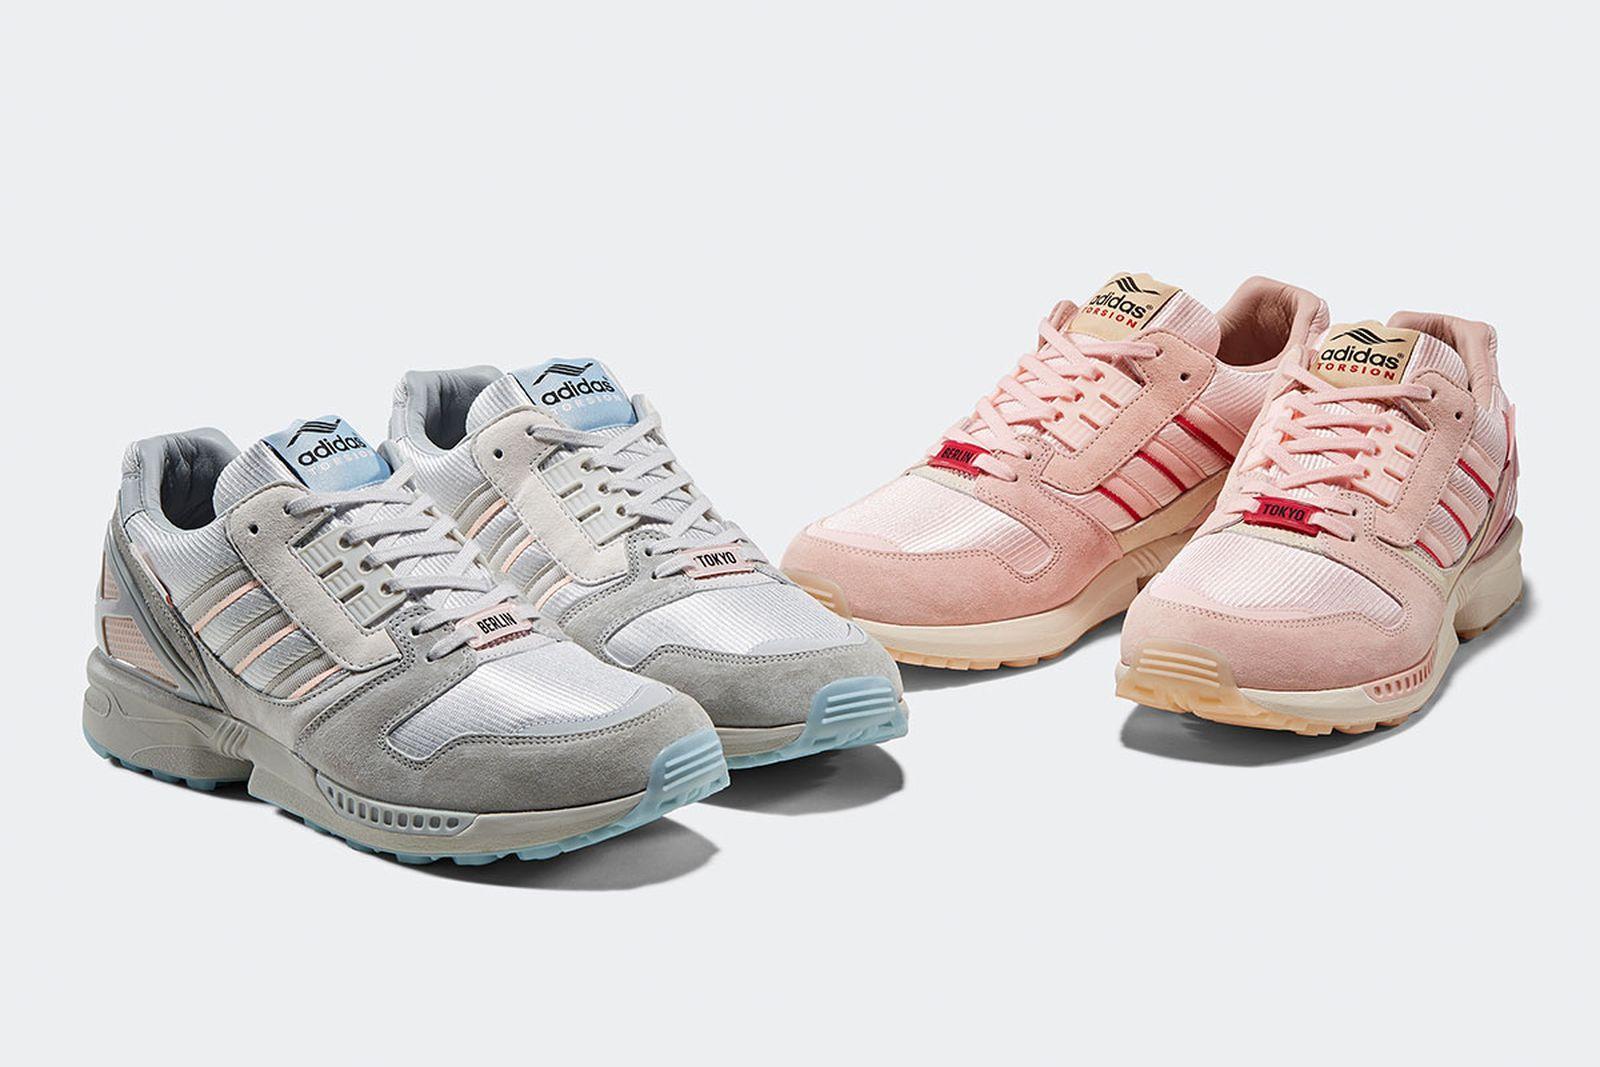 adidas-originals-zx-8000-kirschblutenallee-release-date-price-03